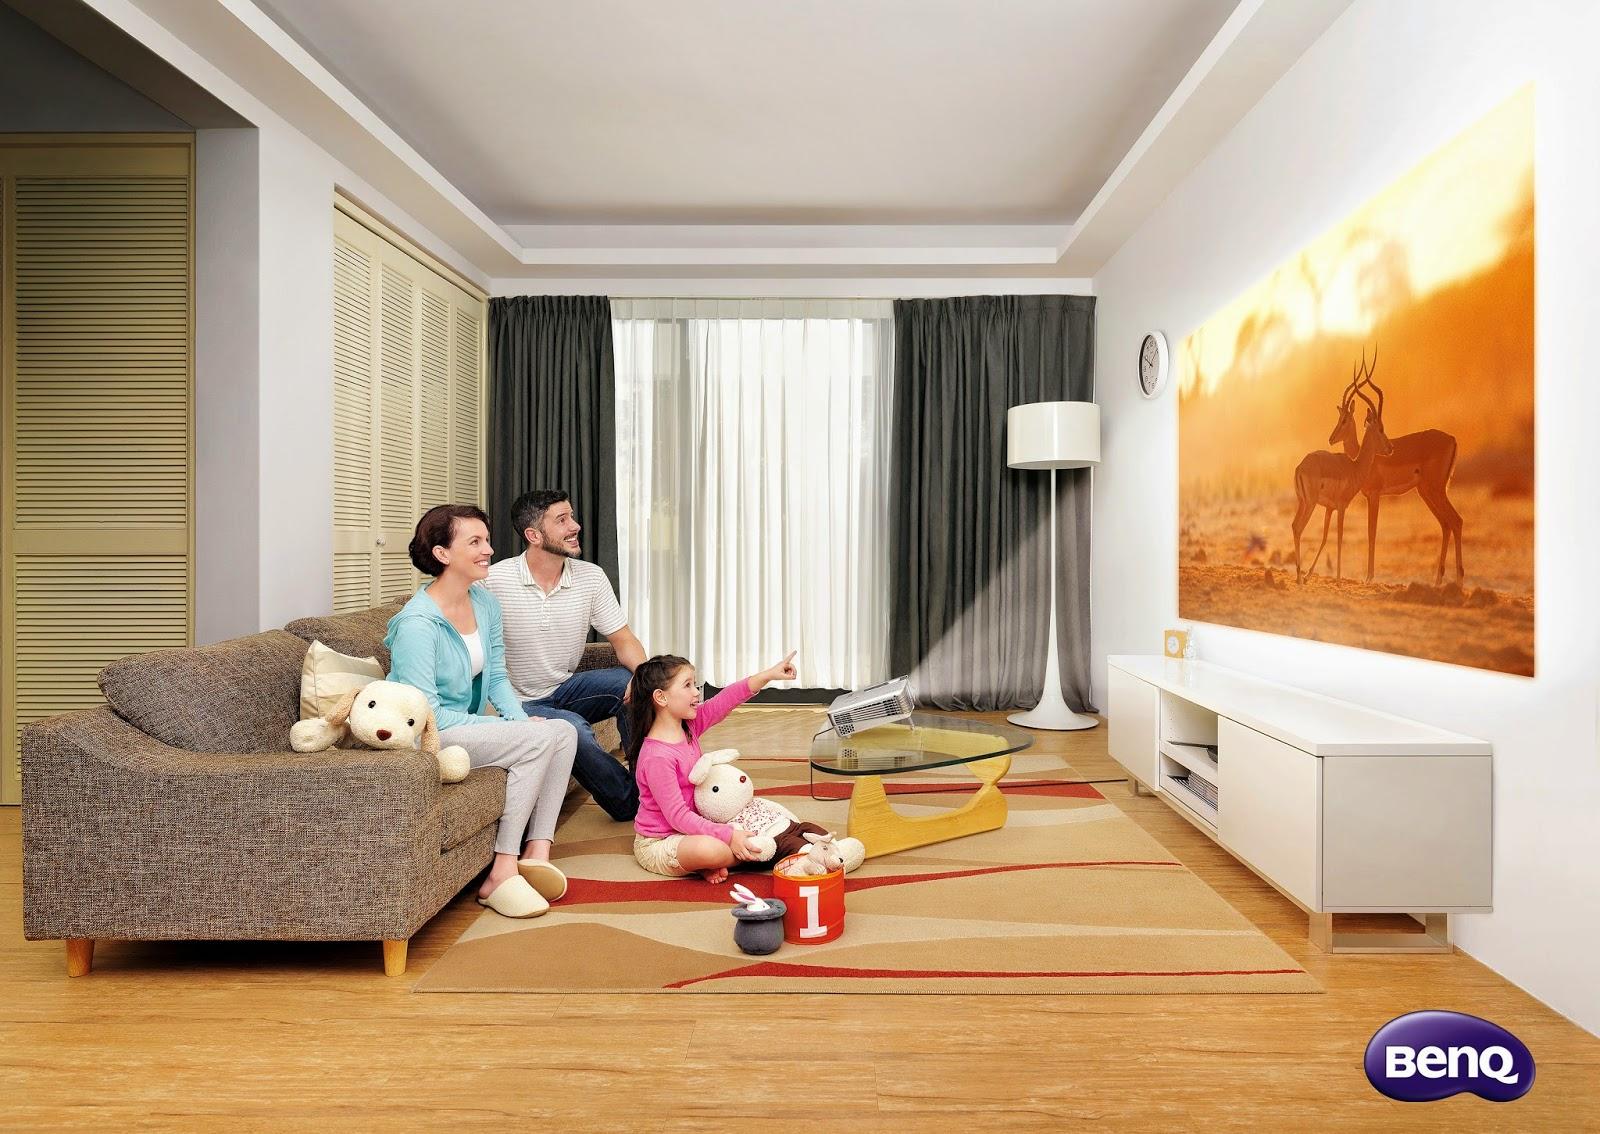 Benq S Projectors Transform Homes Into Cinemas Missyblurkit